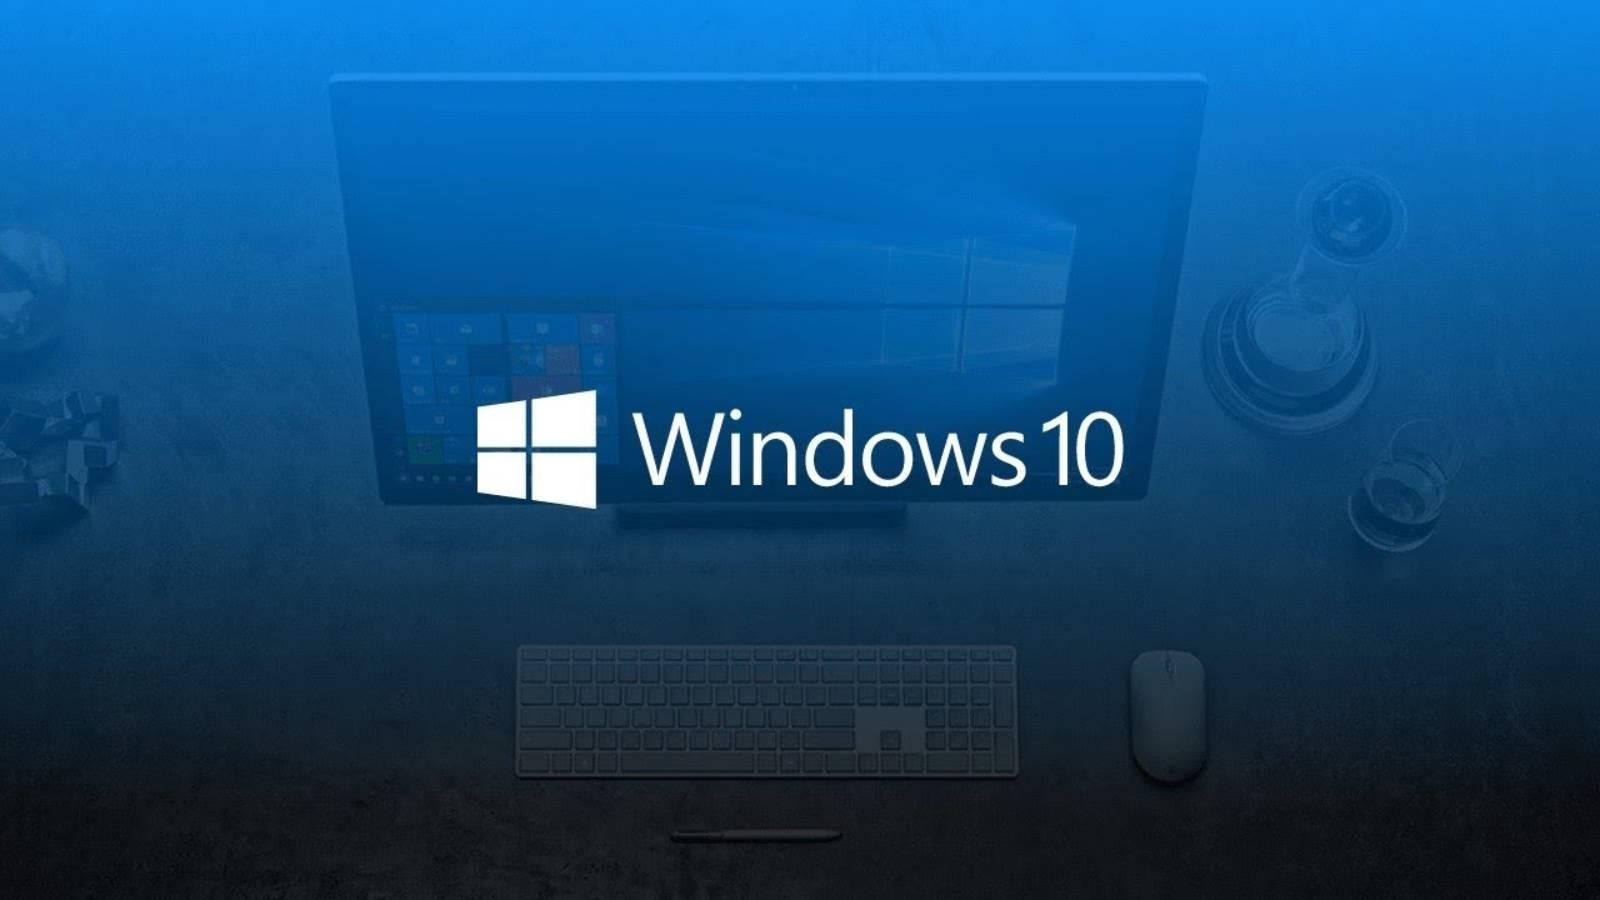 windows 10 900 milioane